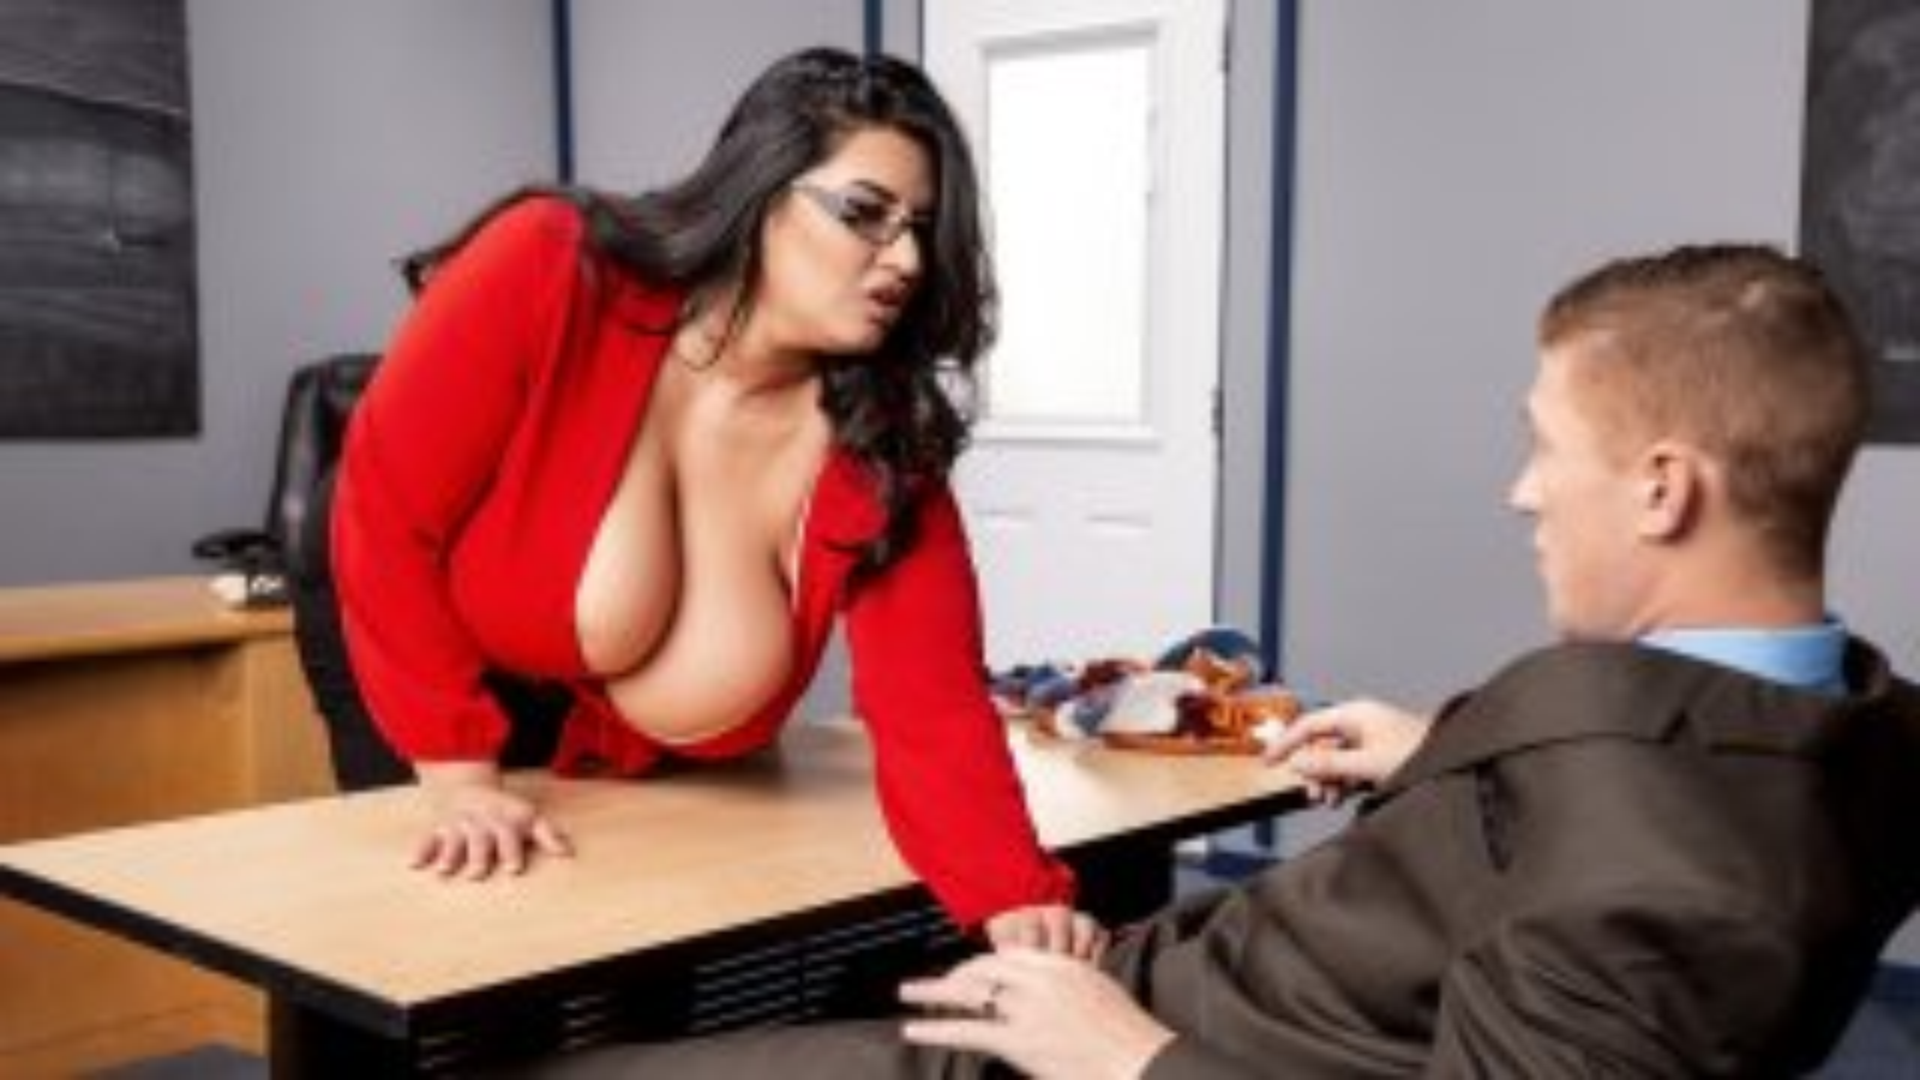 Disciplinary Action - Big Tits At School